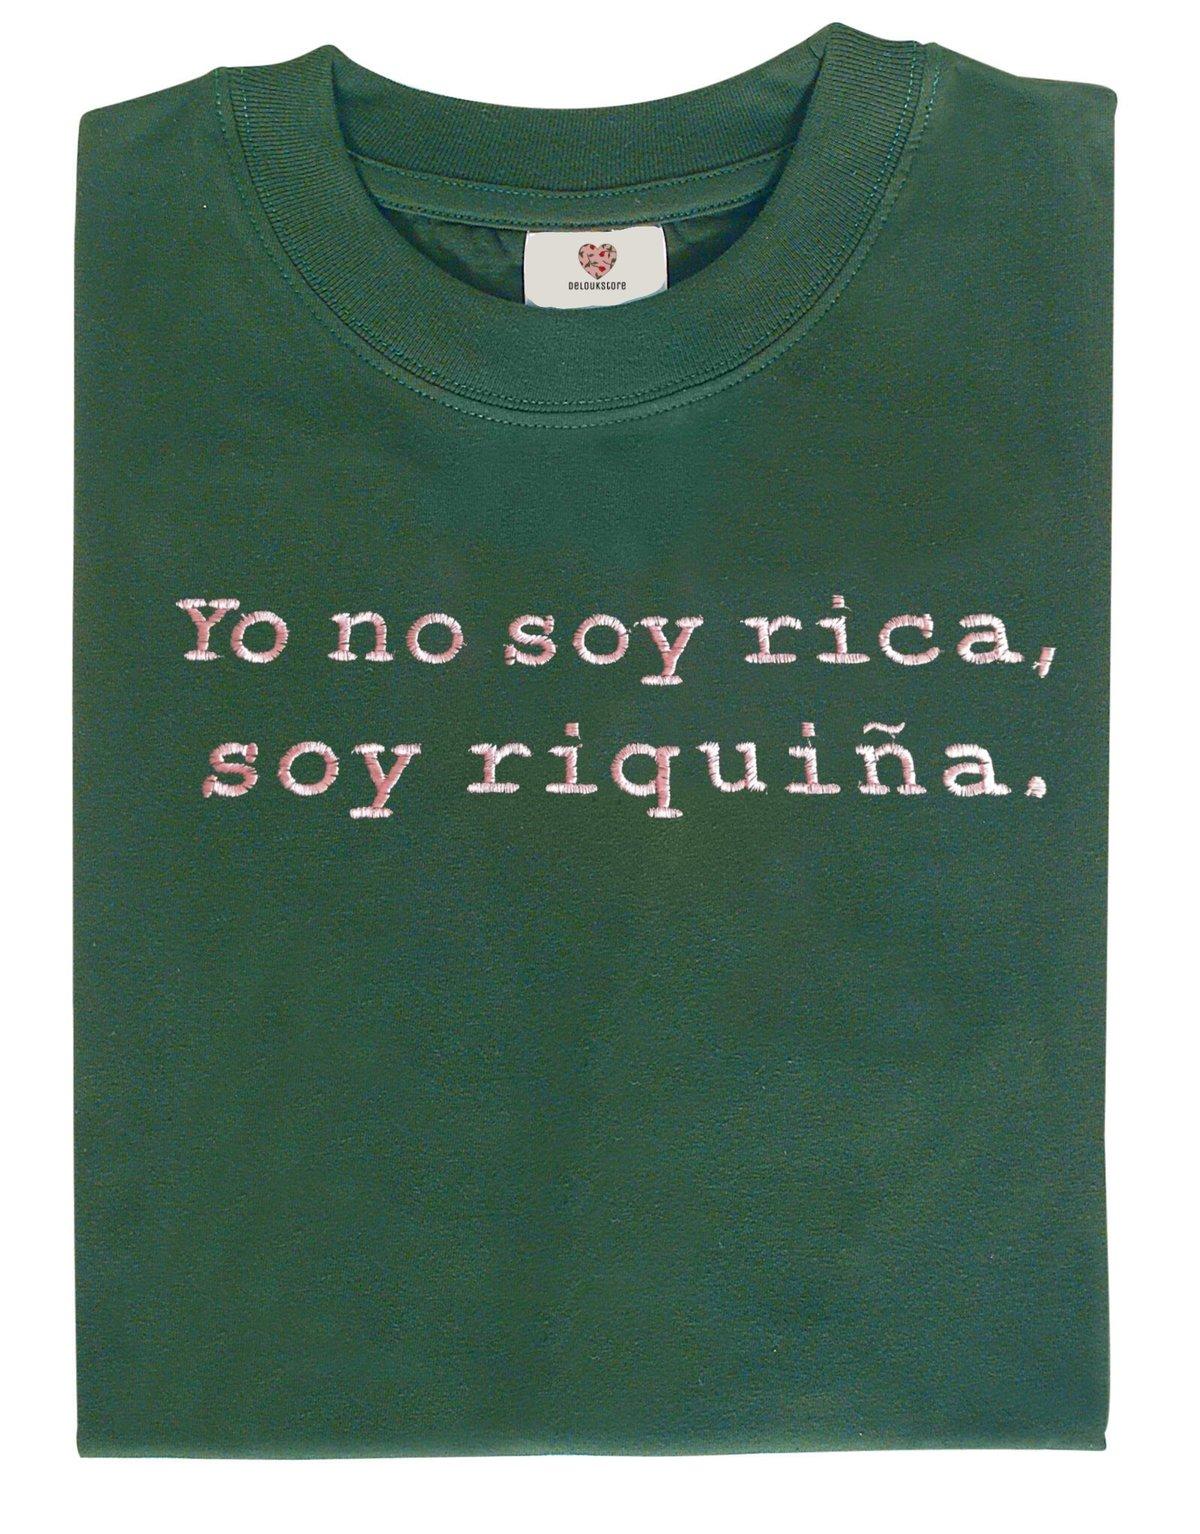 Image of Camiseta Riquiña